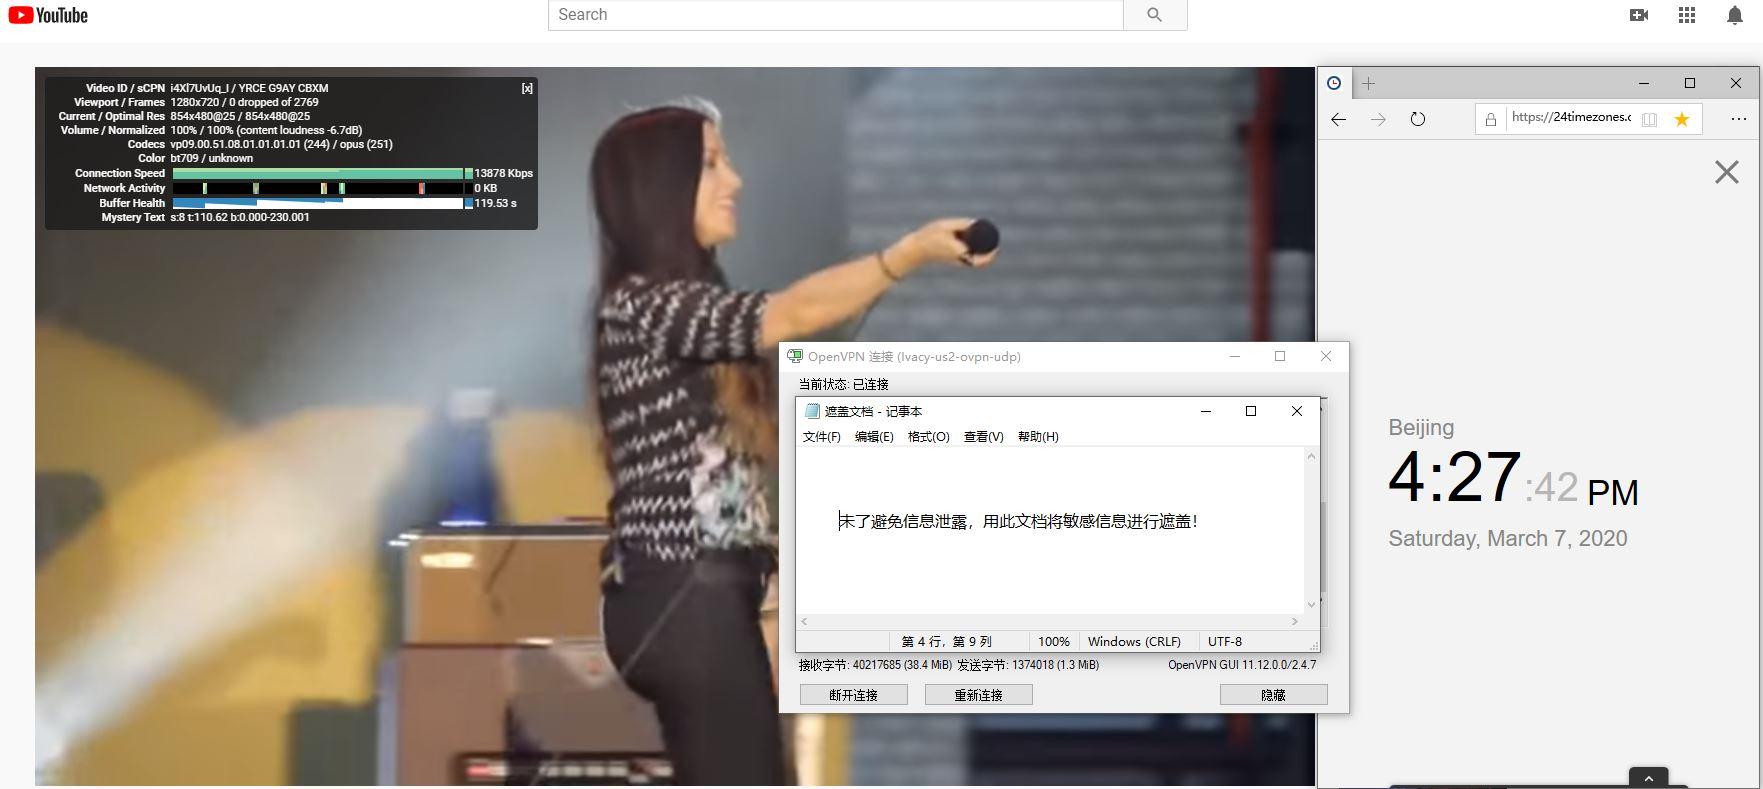 Windows10 IvacyVPN OpenVPN US2 中国VPN翻墙 科学上网 Youtube测速 - 20200307